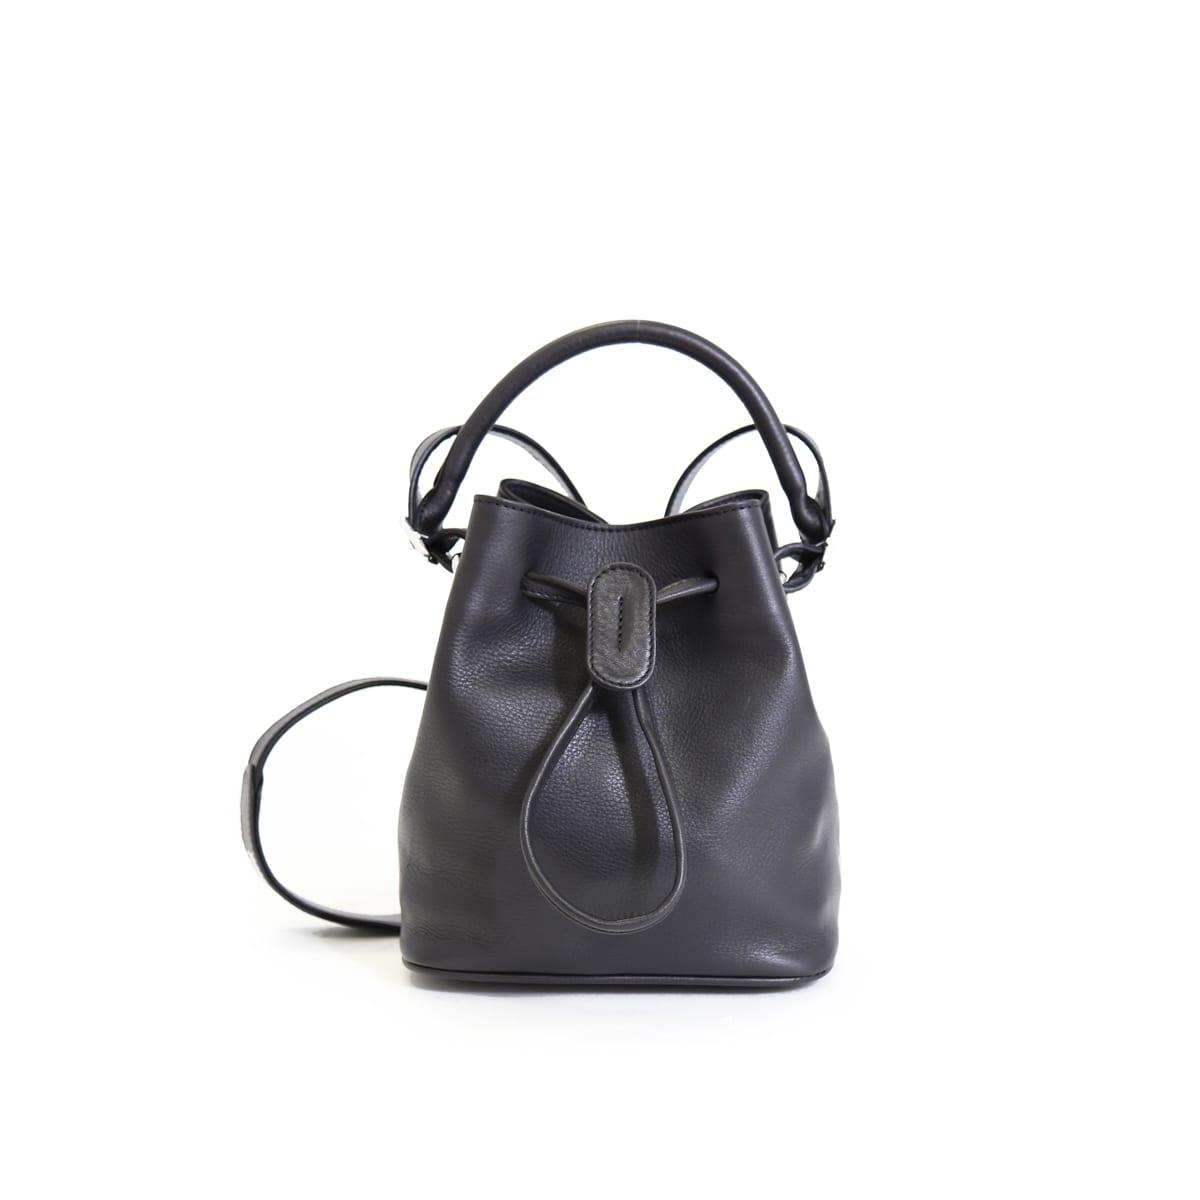 2e0b91936f LUMI Klara Small Bucket Bag in timeless and elegant black.